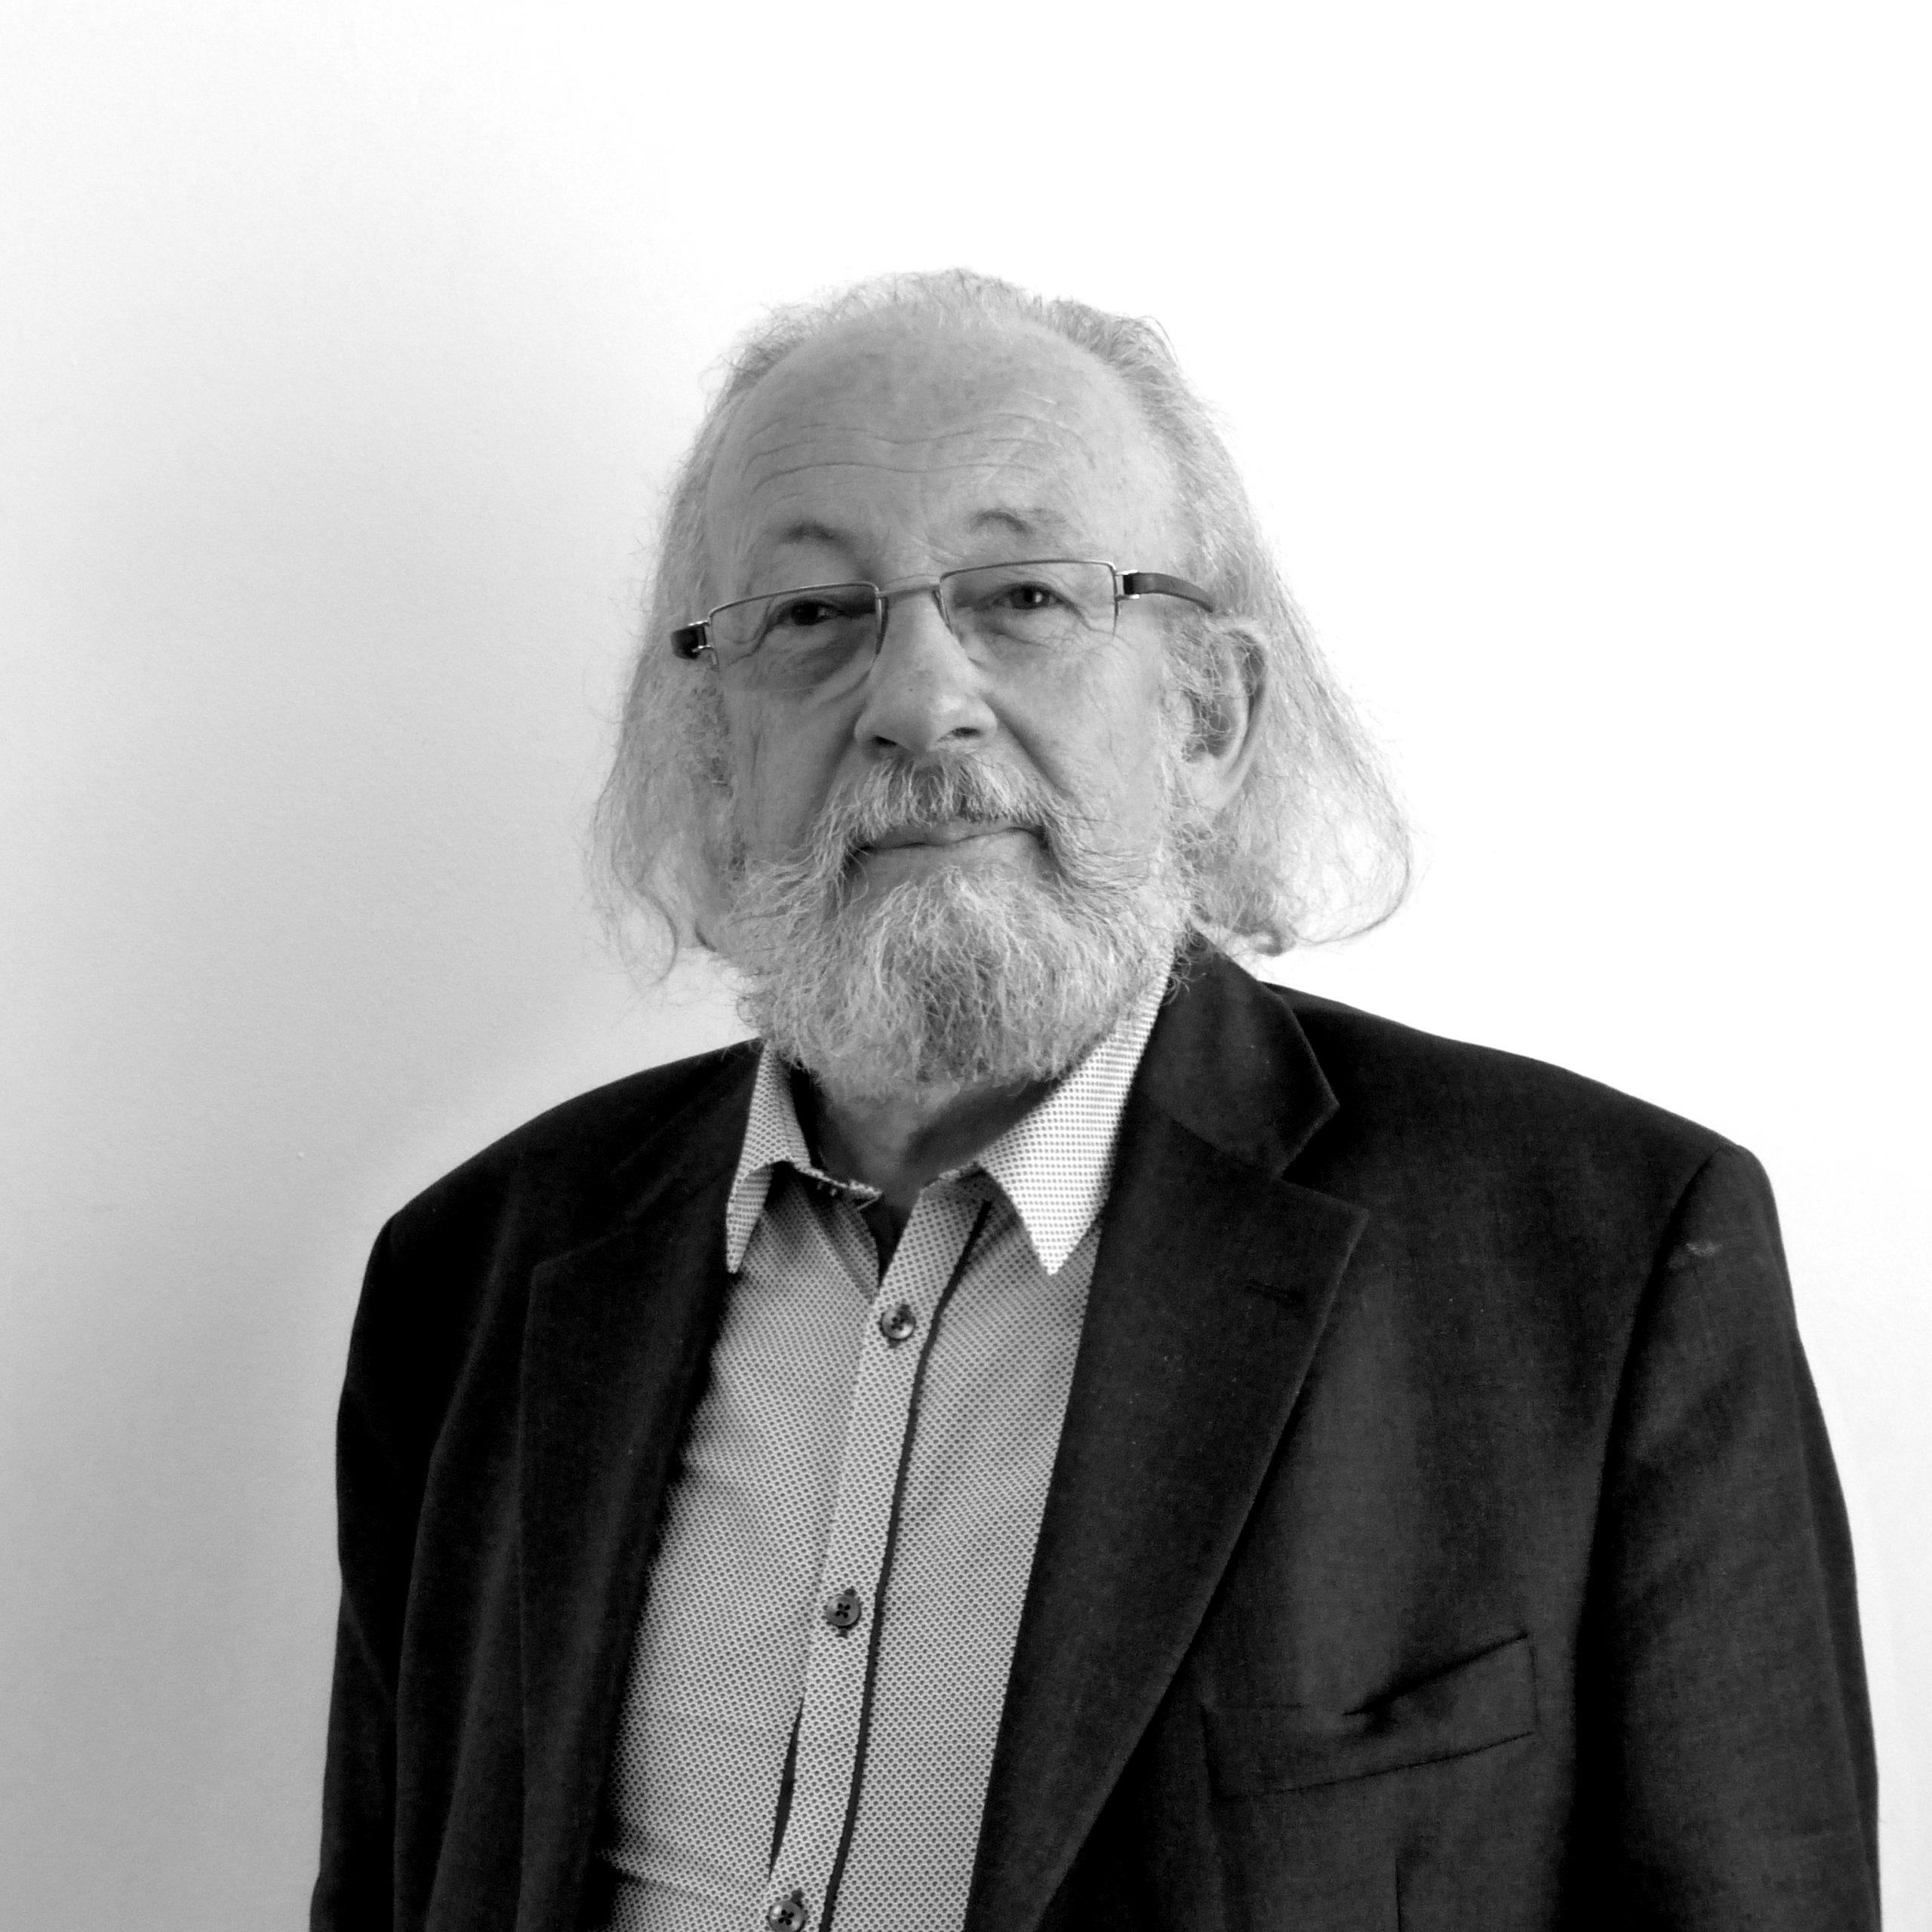 Pierre Jézéquel